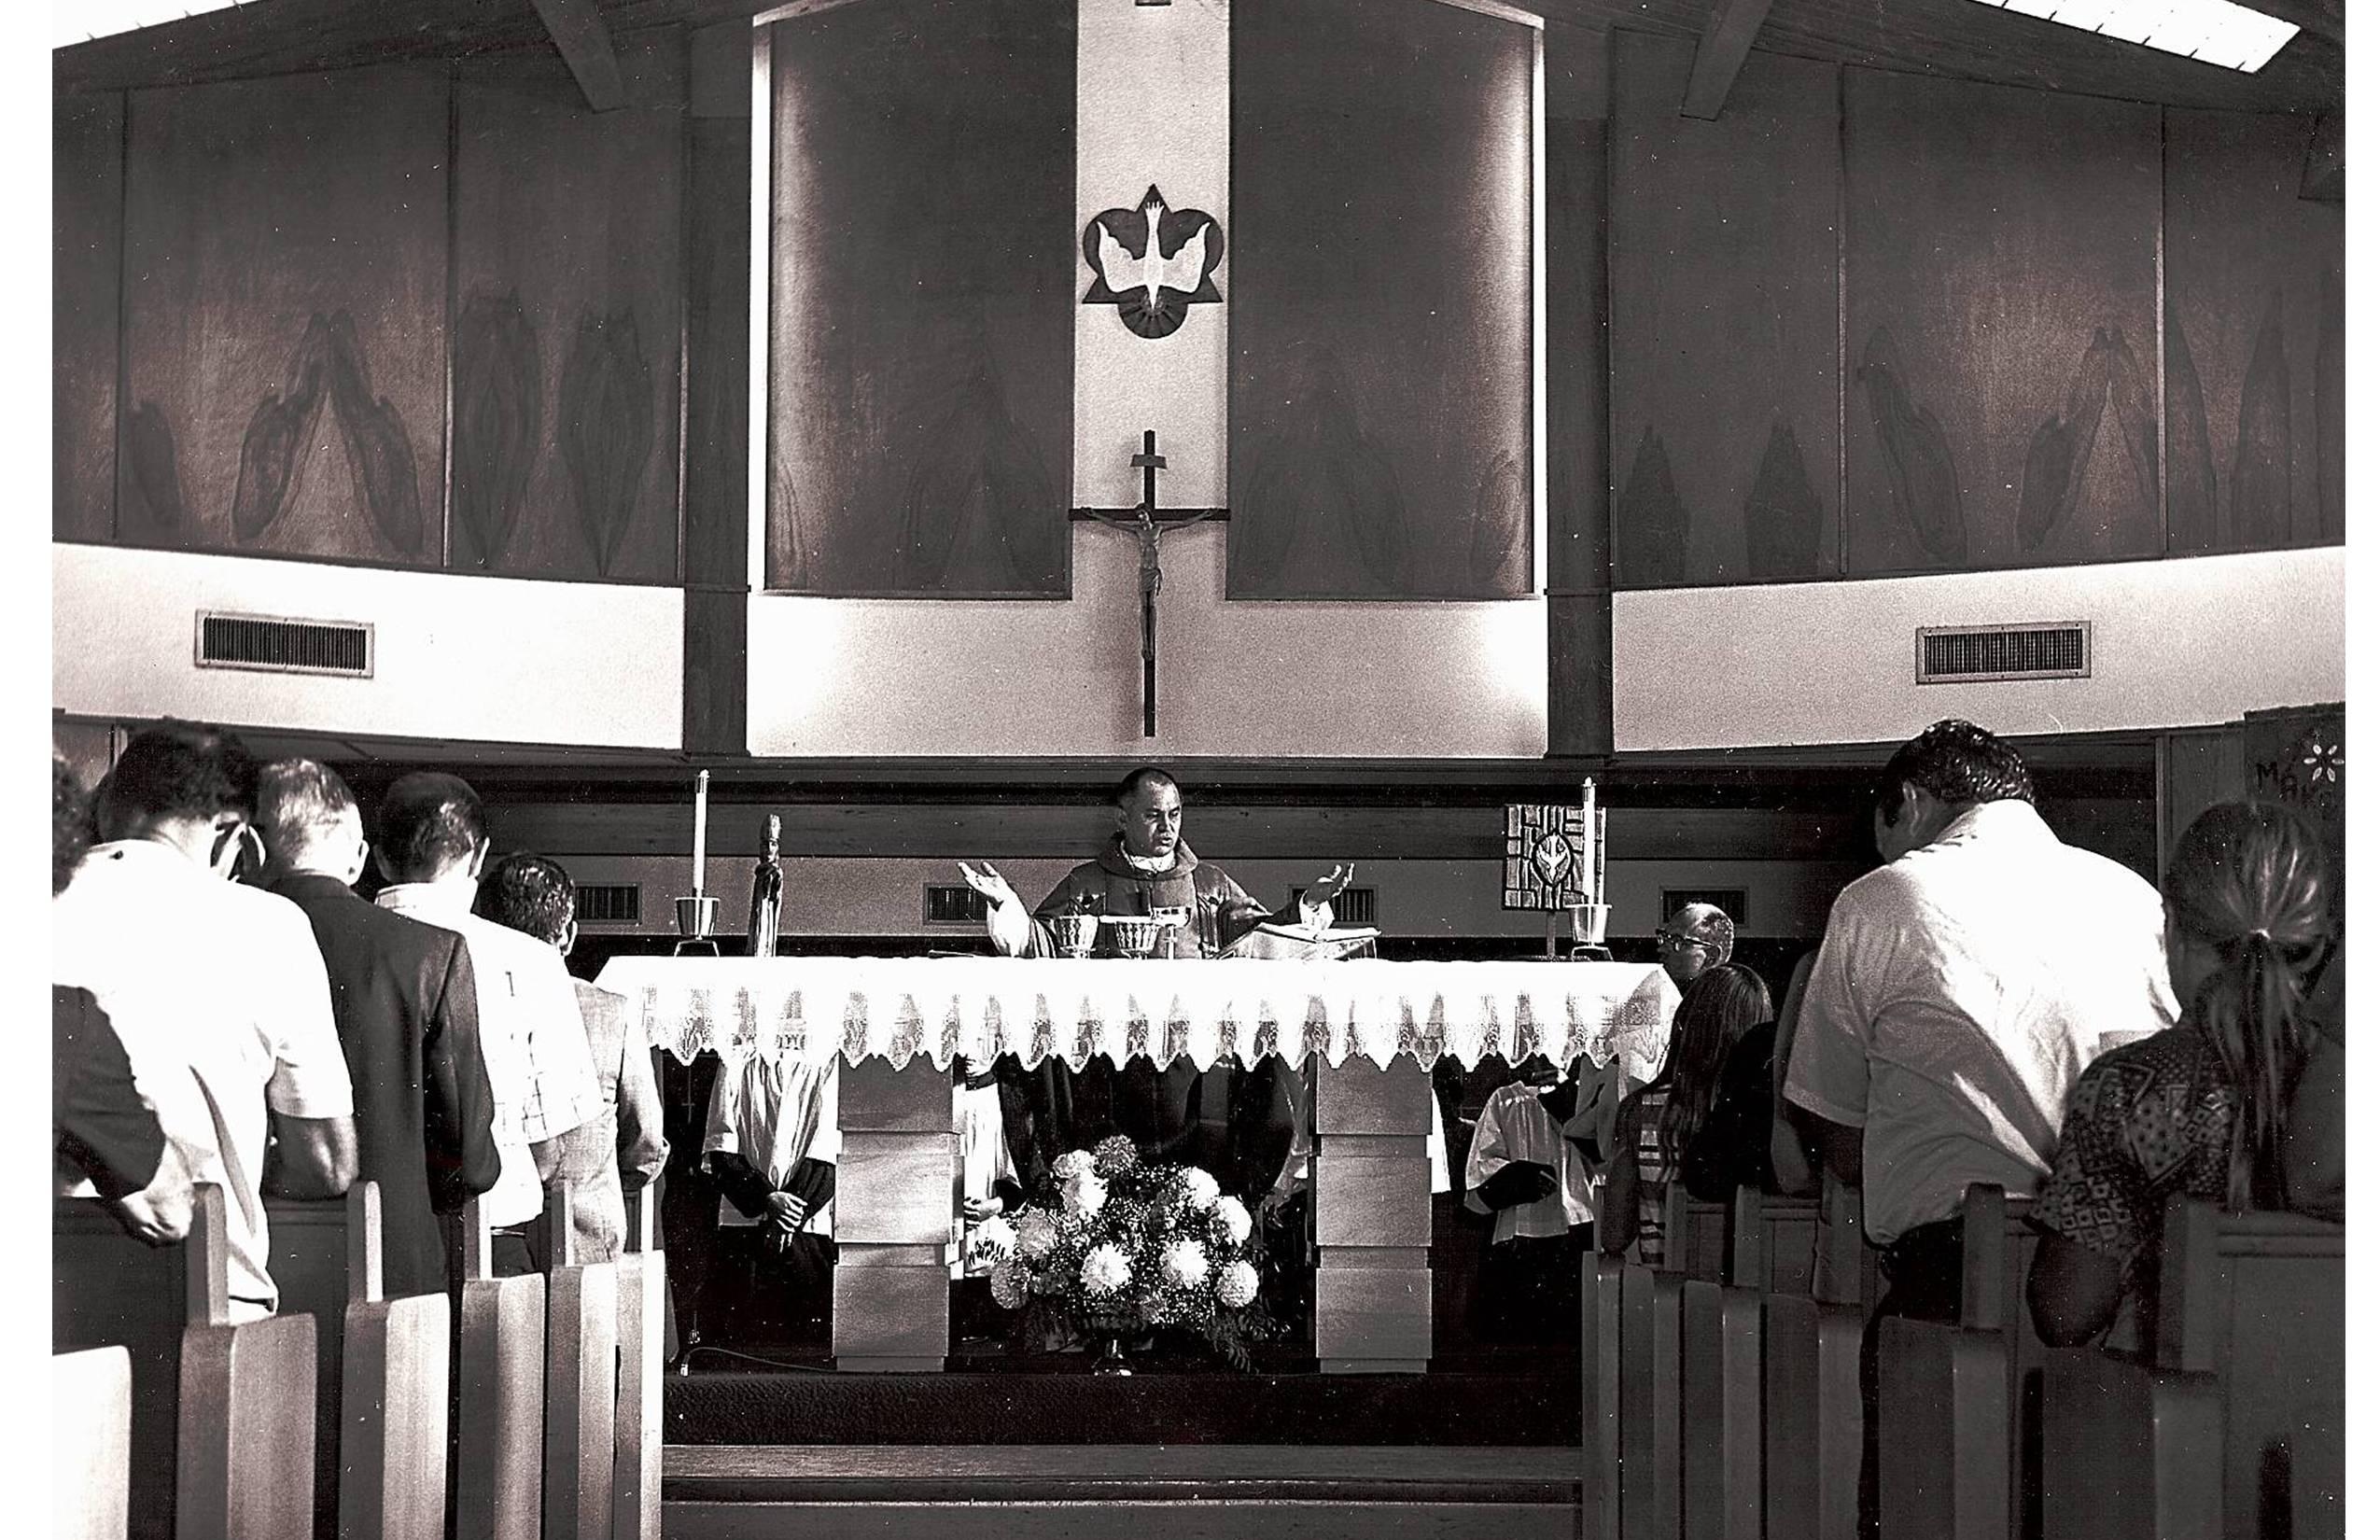 1964 First Bldg. Altar